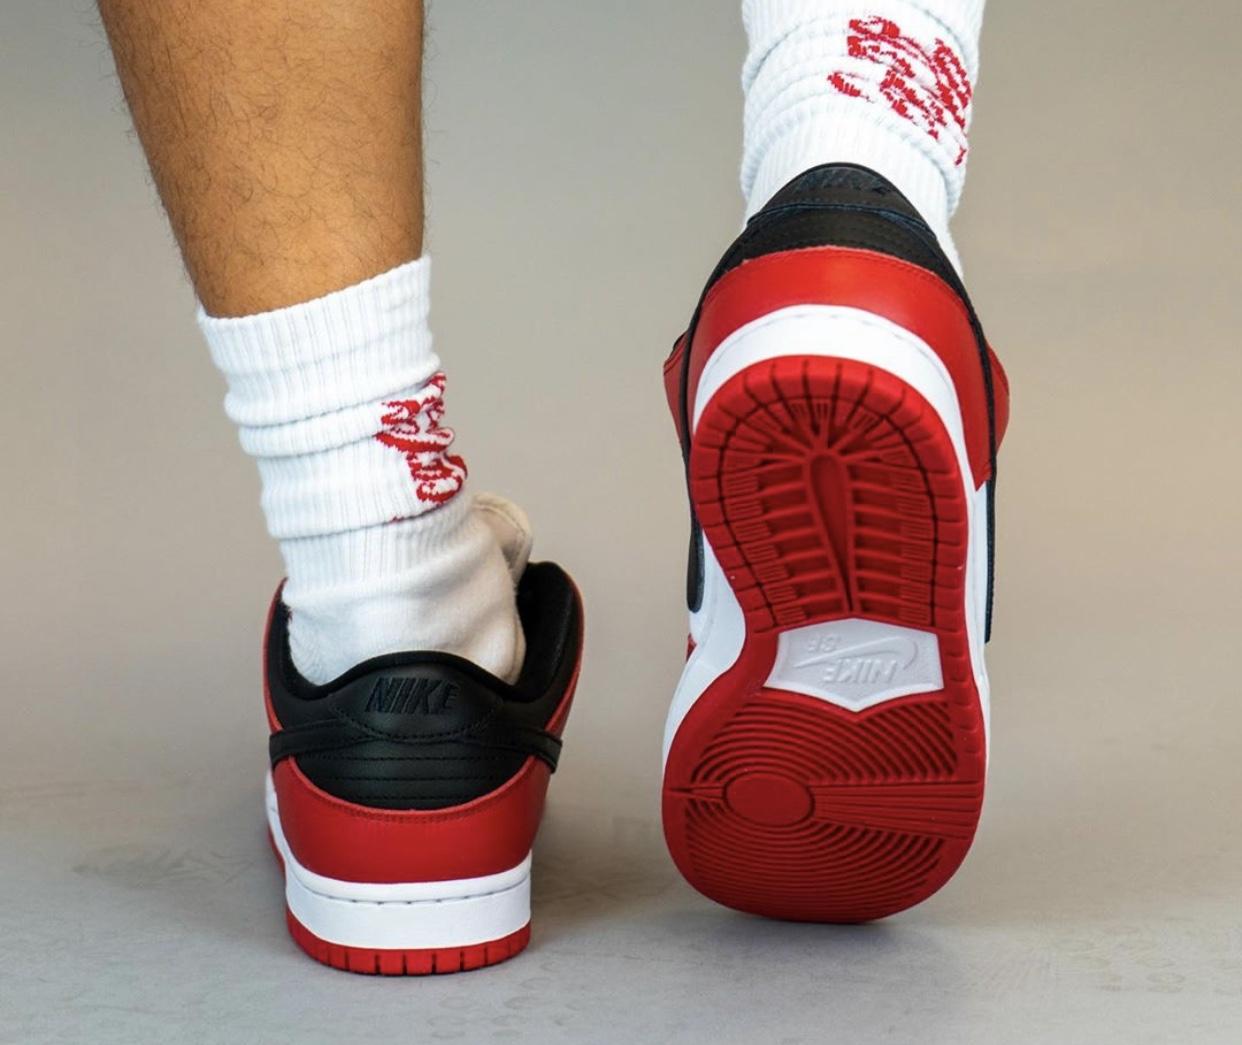 Nike SB Dunk Low Pro Chicago On Feet BQ6817-600